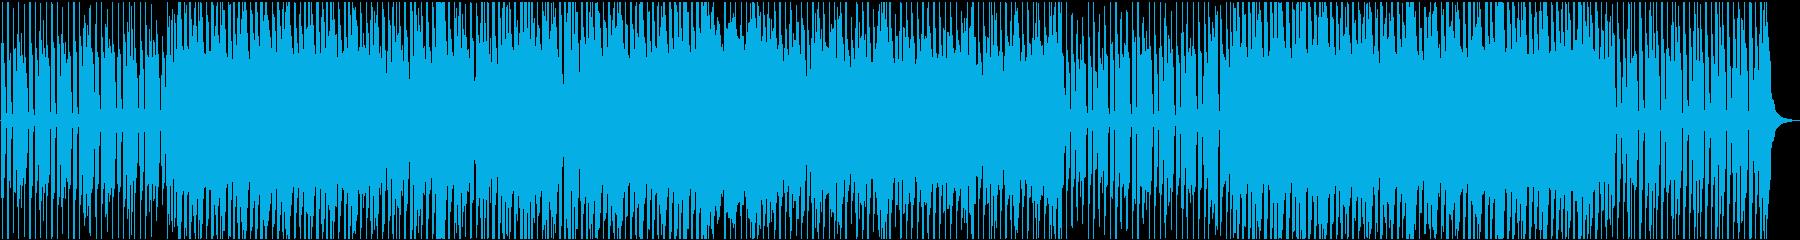 00'sロックンロール。楽しげなOP向けの再生済みの波形